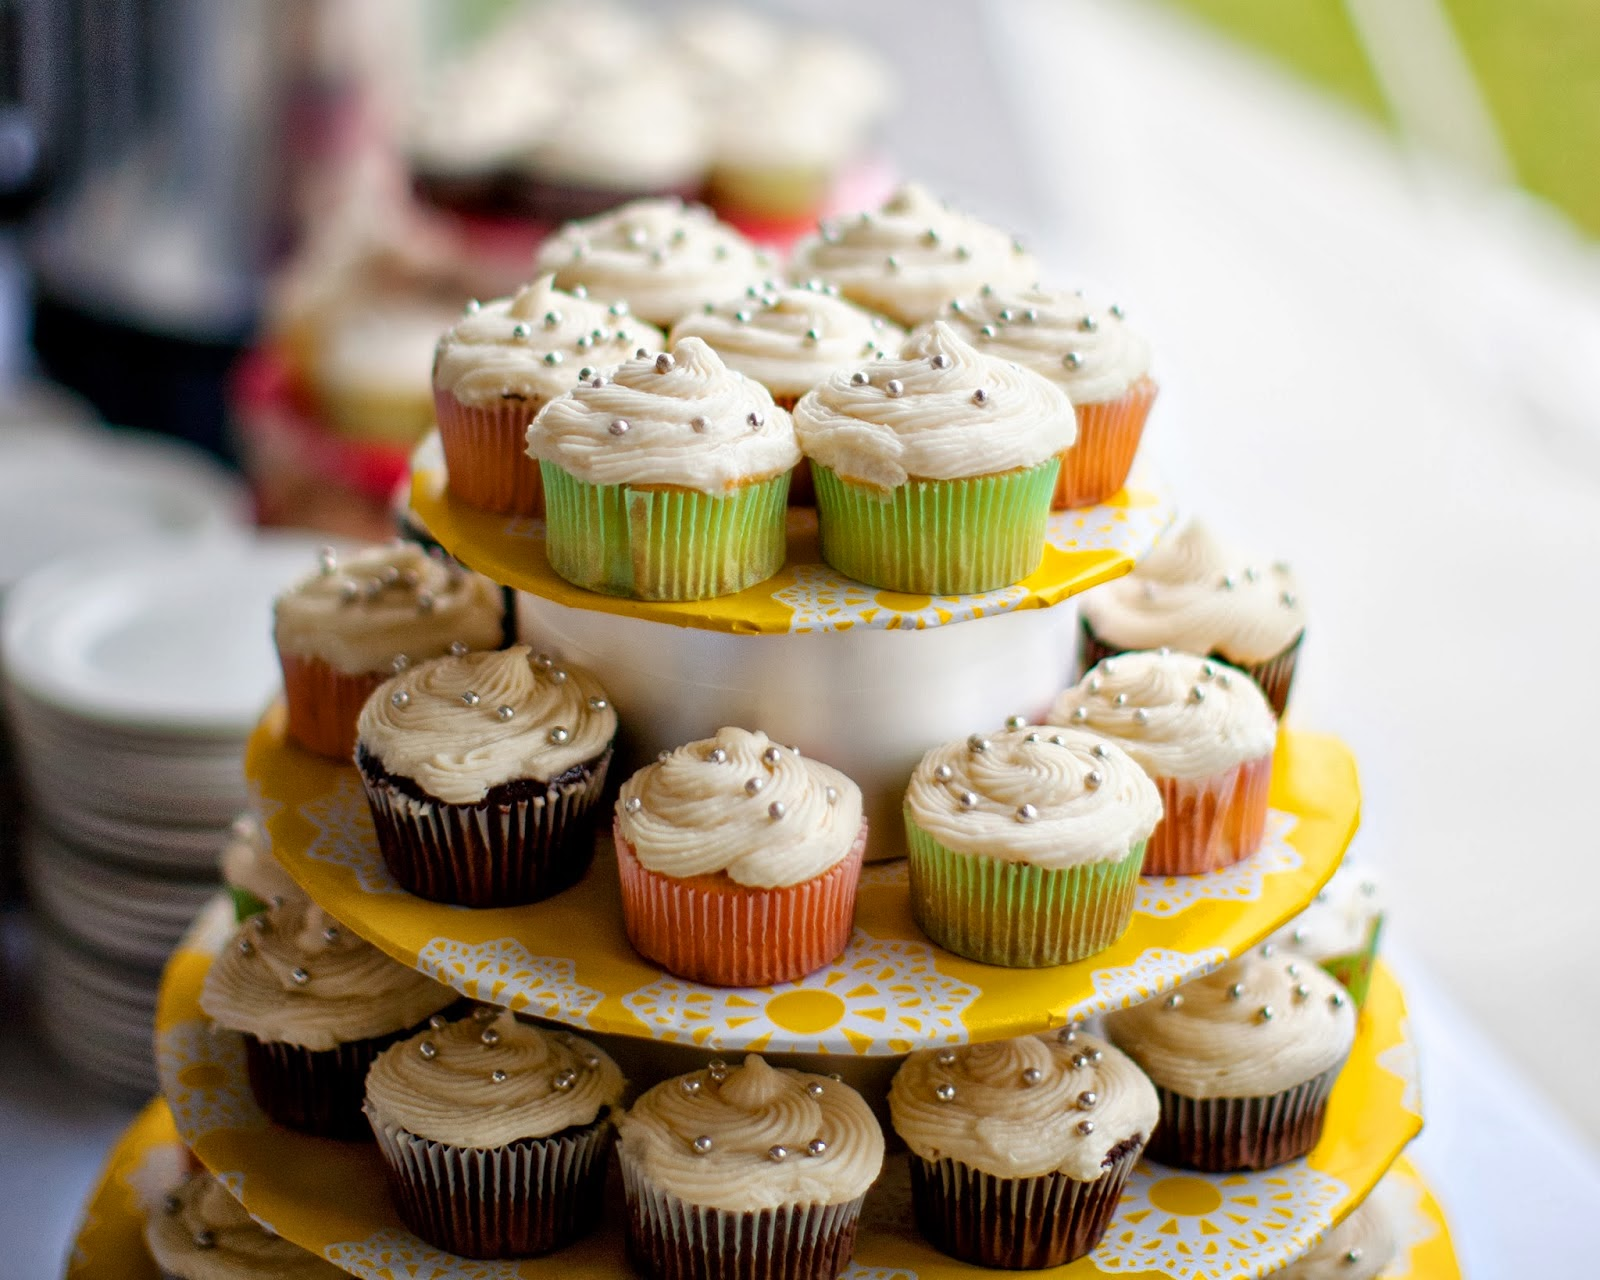 recetas de cocina,receta de cocina, como hacer cupcakes